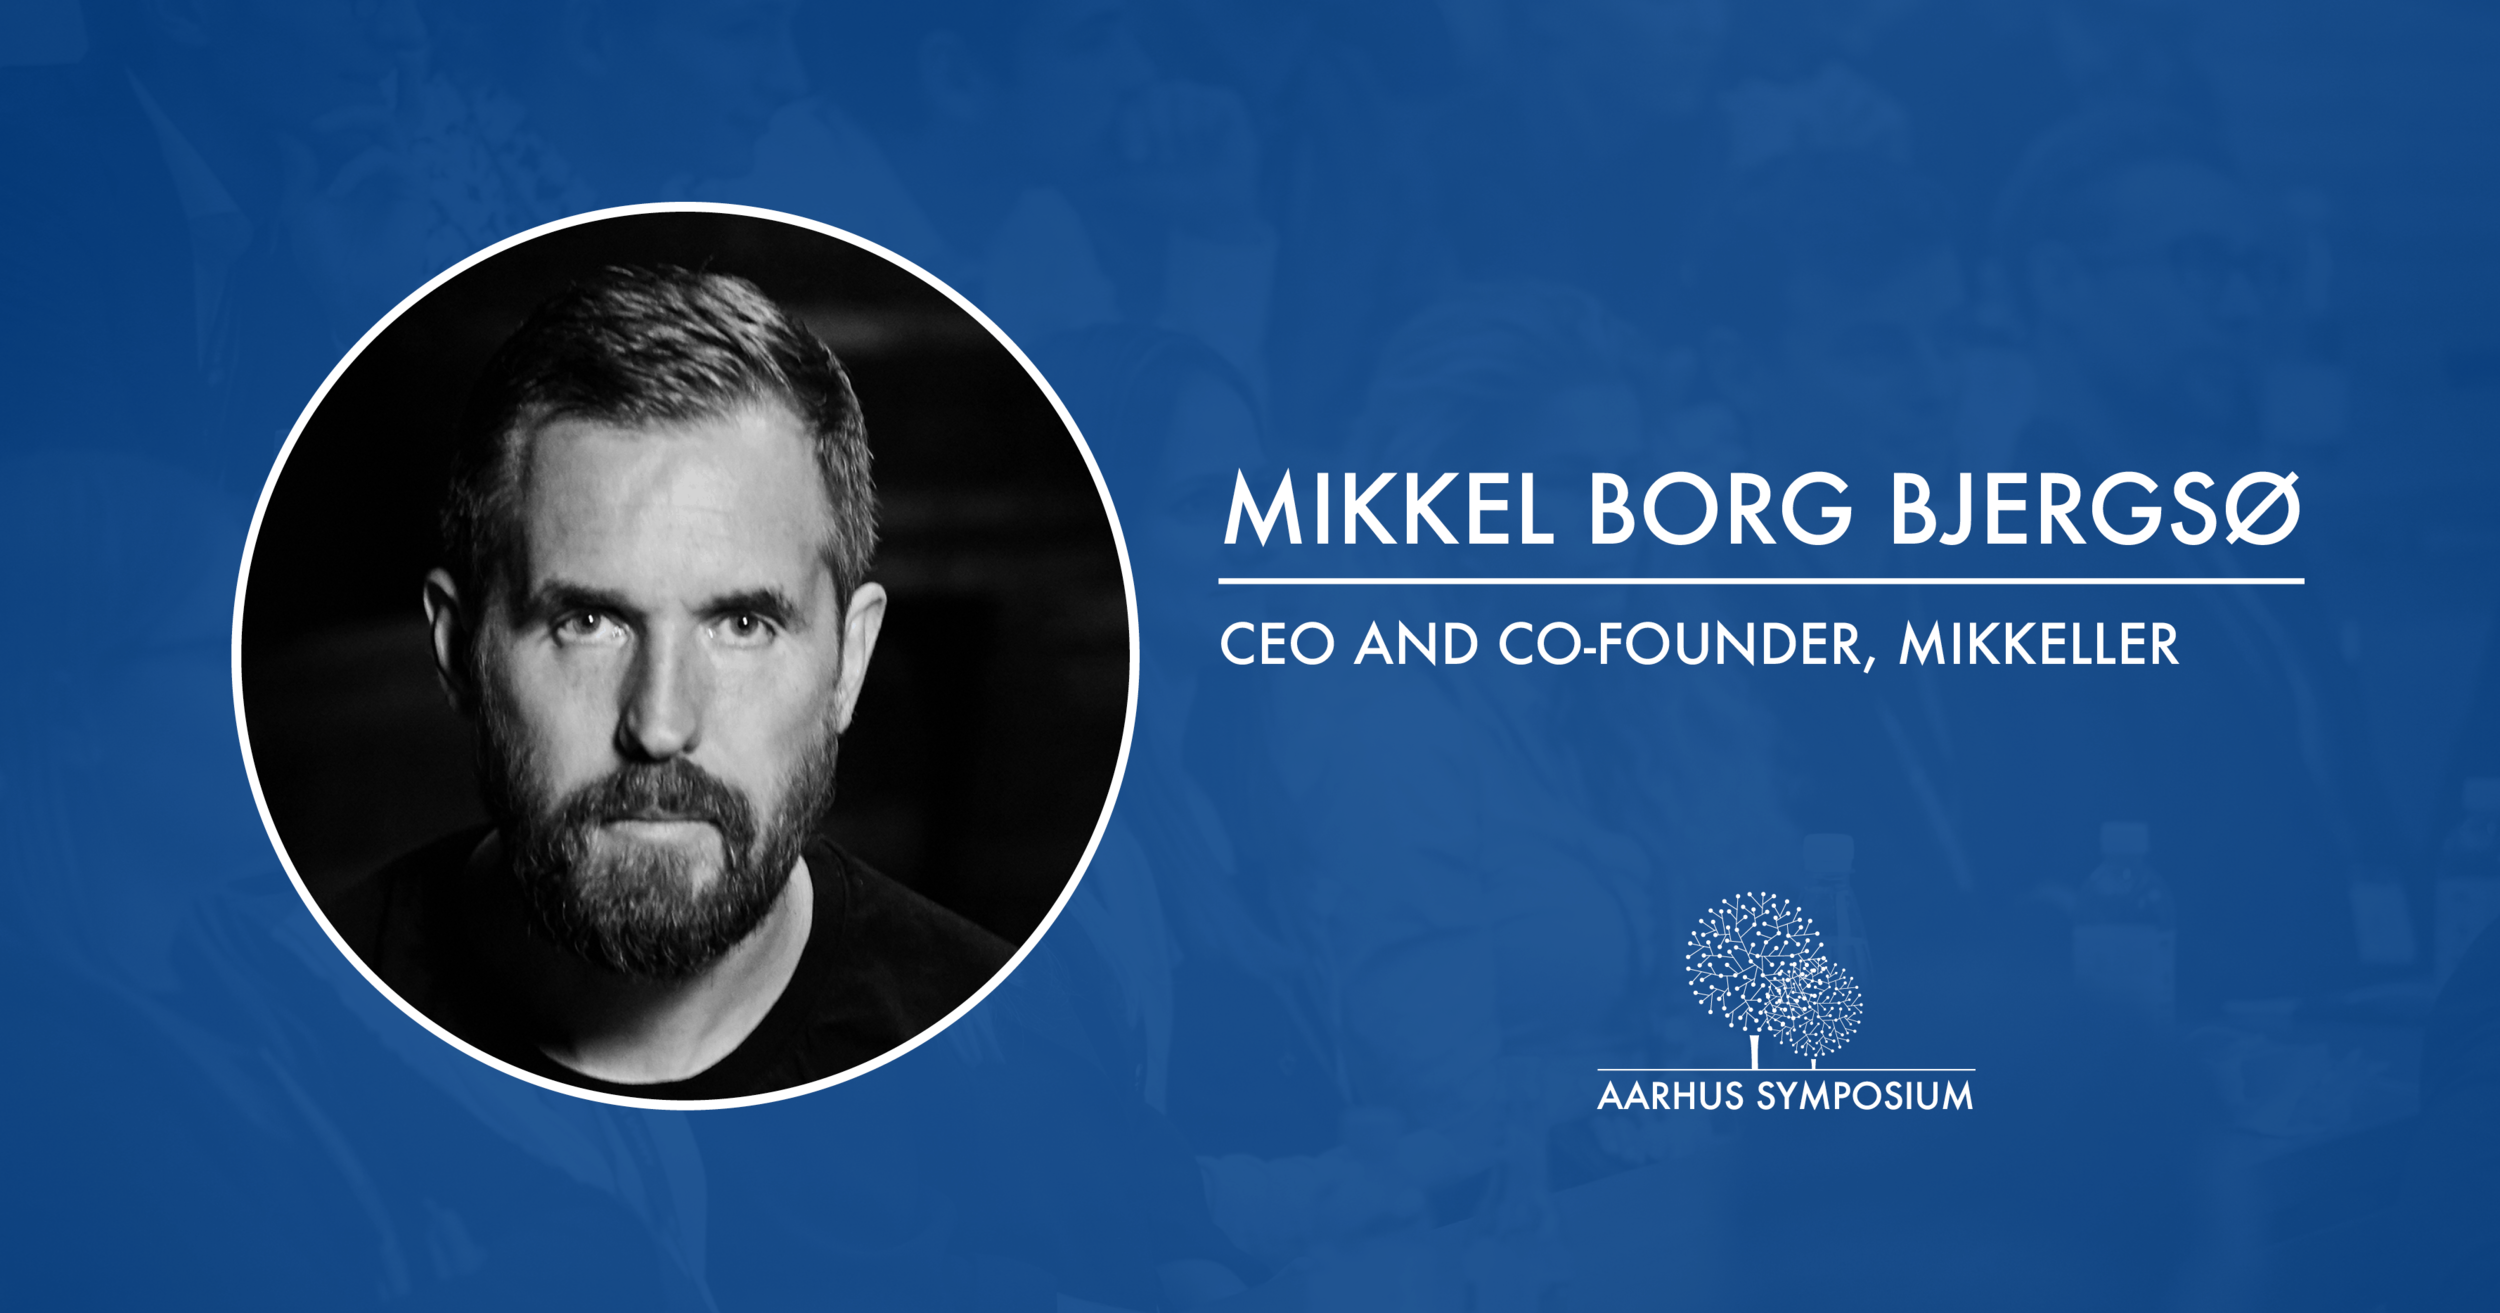 Mikkel-Borg-Bjergsoe_WEB.png